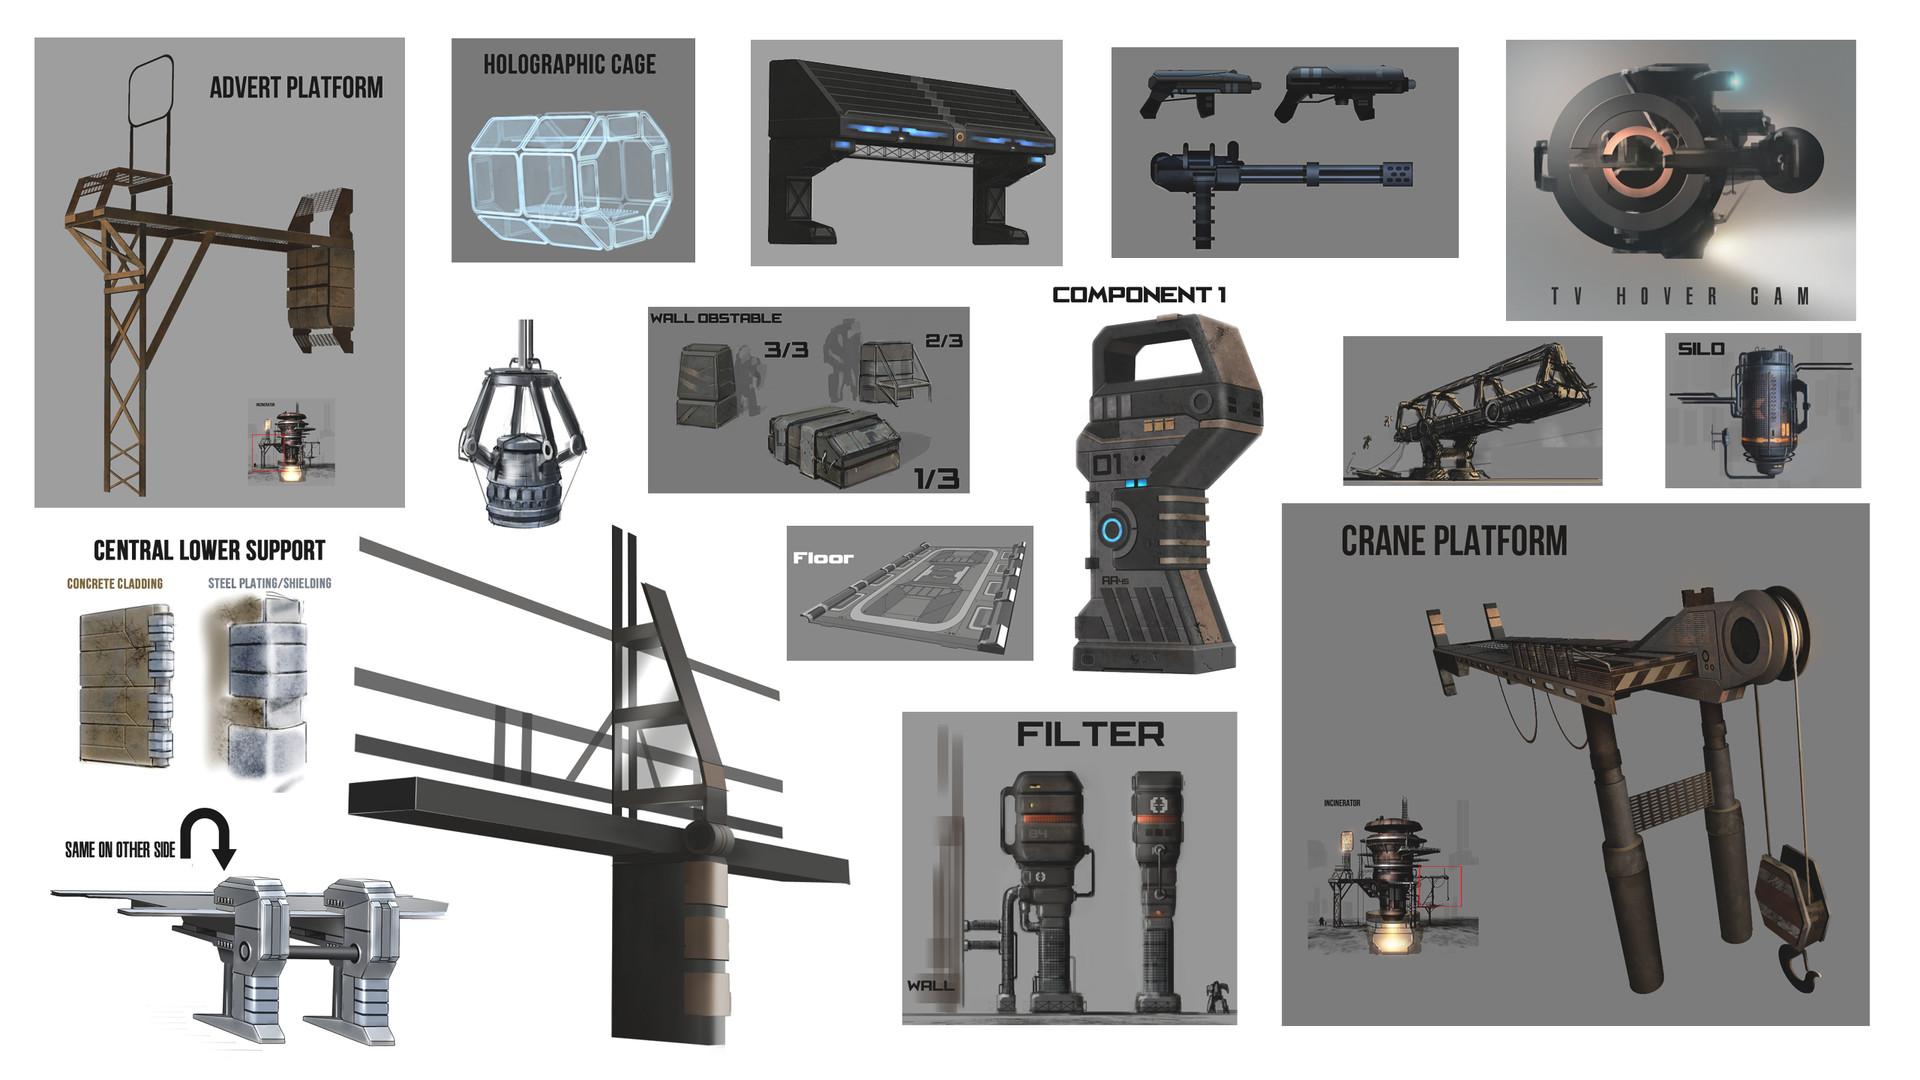 Heavy Gear Concepts 4 - 2013